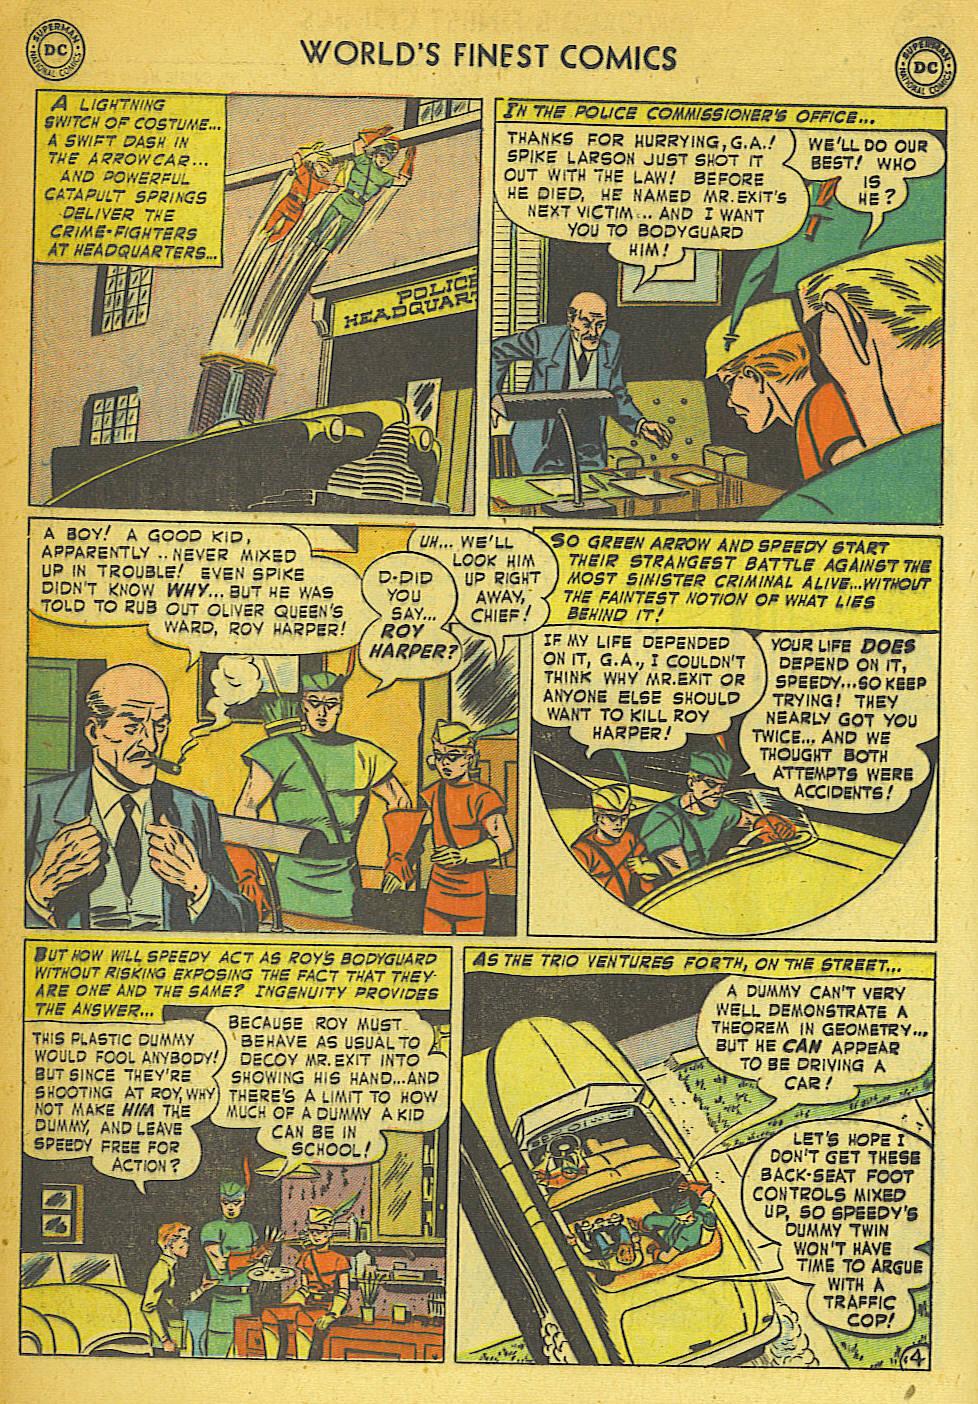 Read online World's Finest Comics comic -  Issue #57 - 20